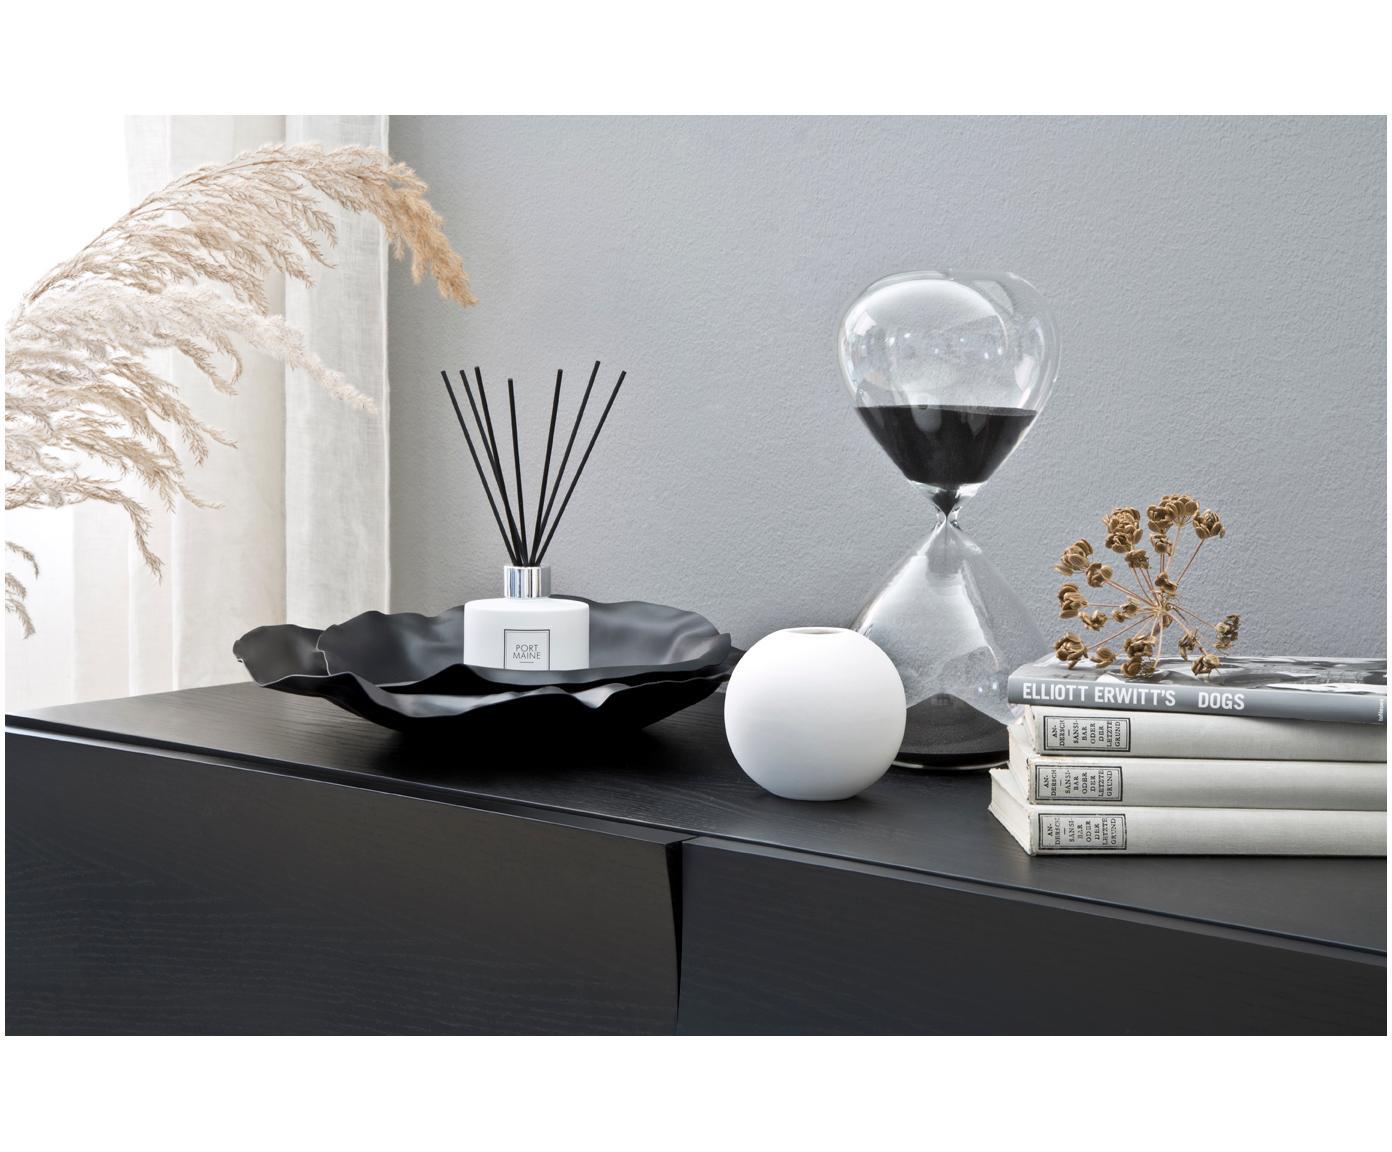 Vaso a sfera fatto a mano Ball, Ceramica, Bianco, Ø 10 x Alt. 10 cm